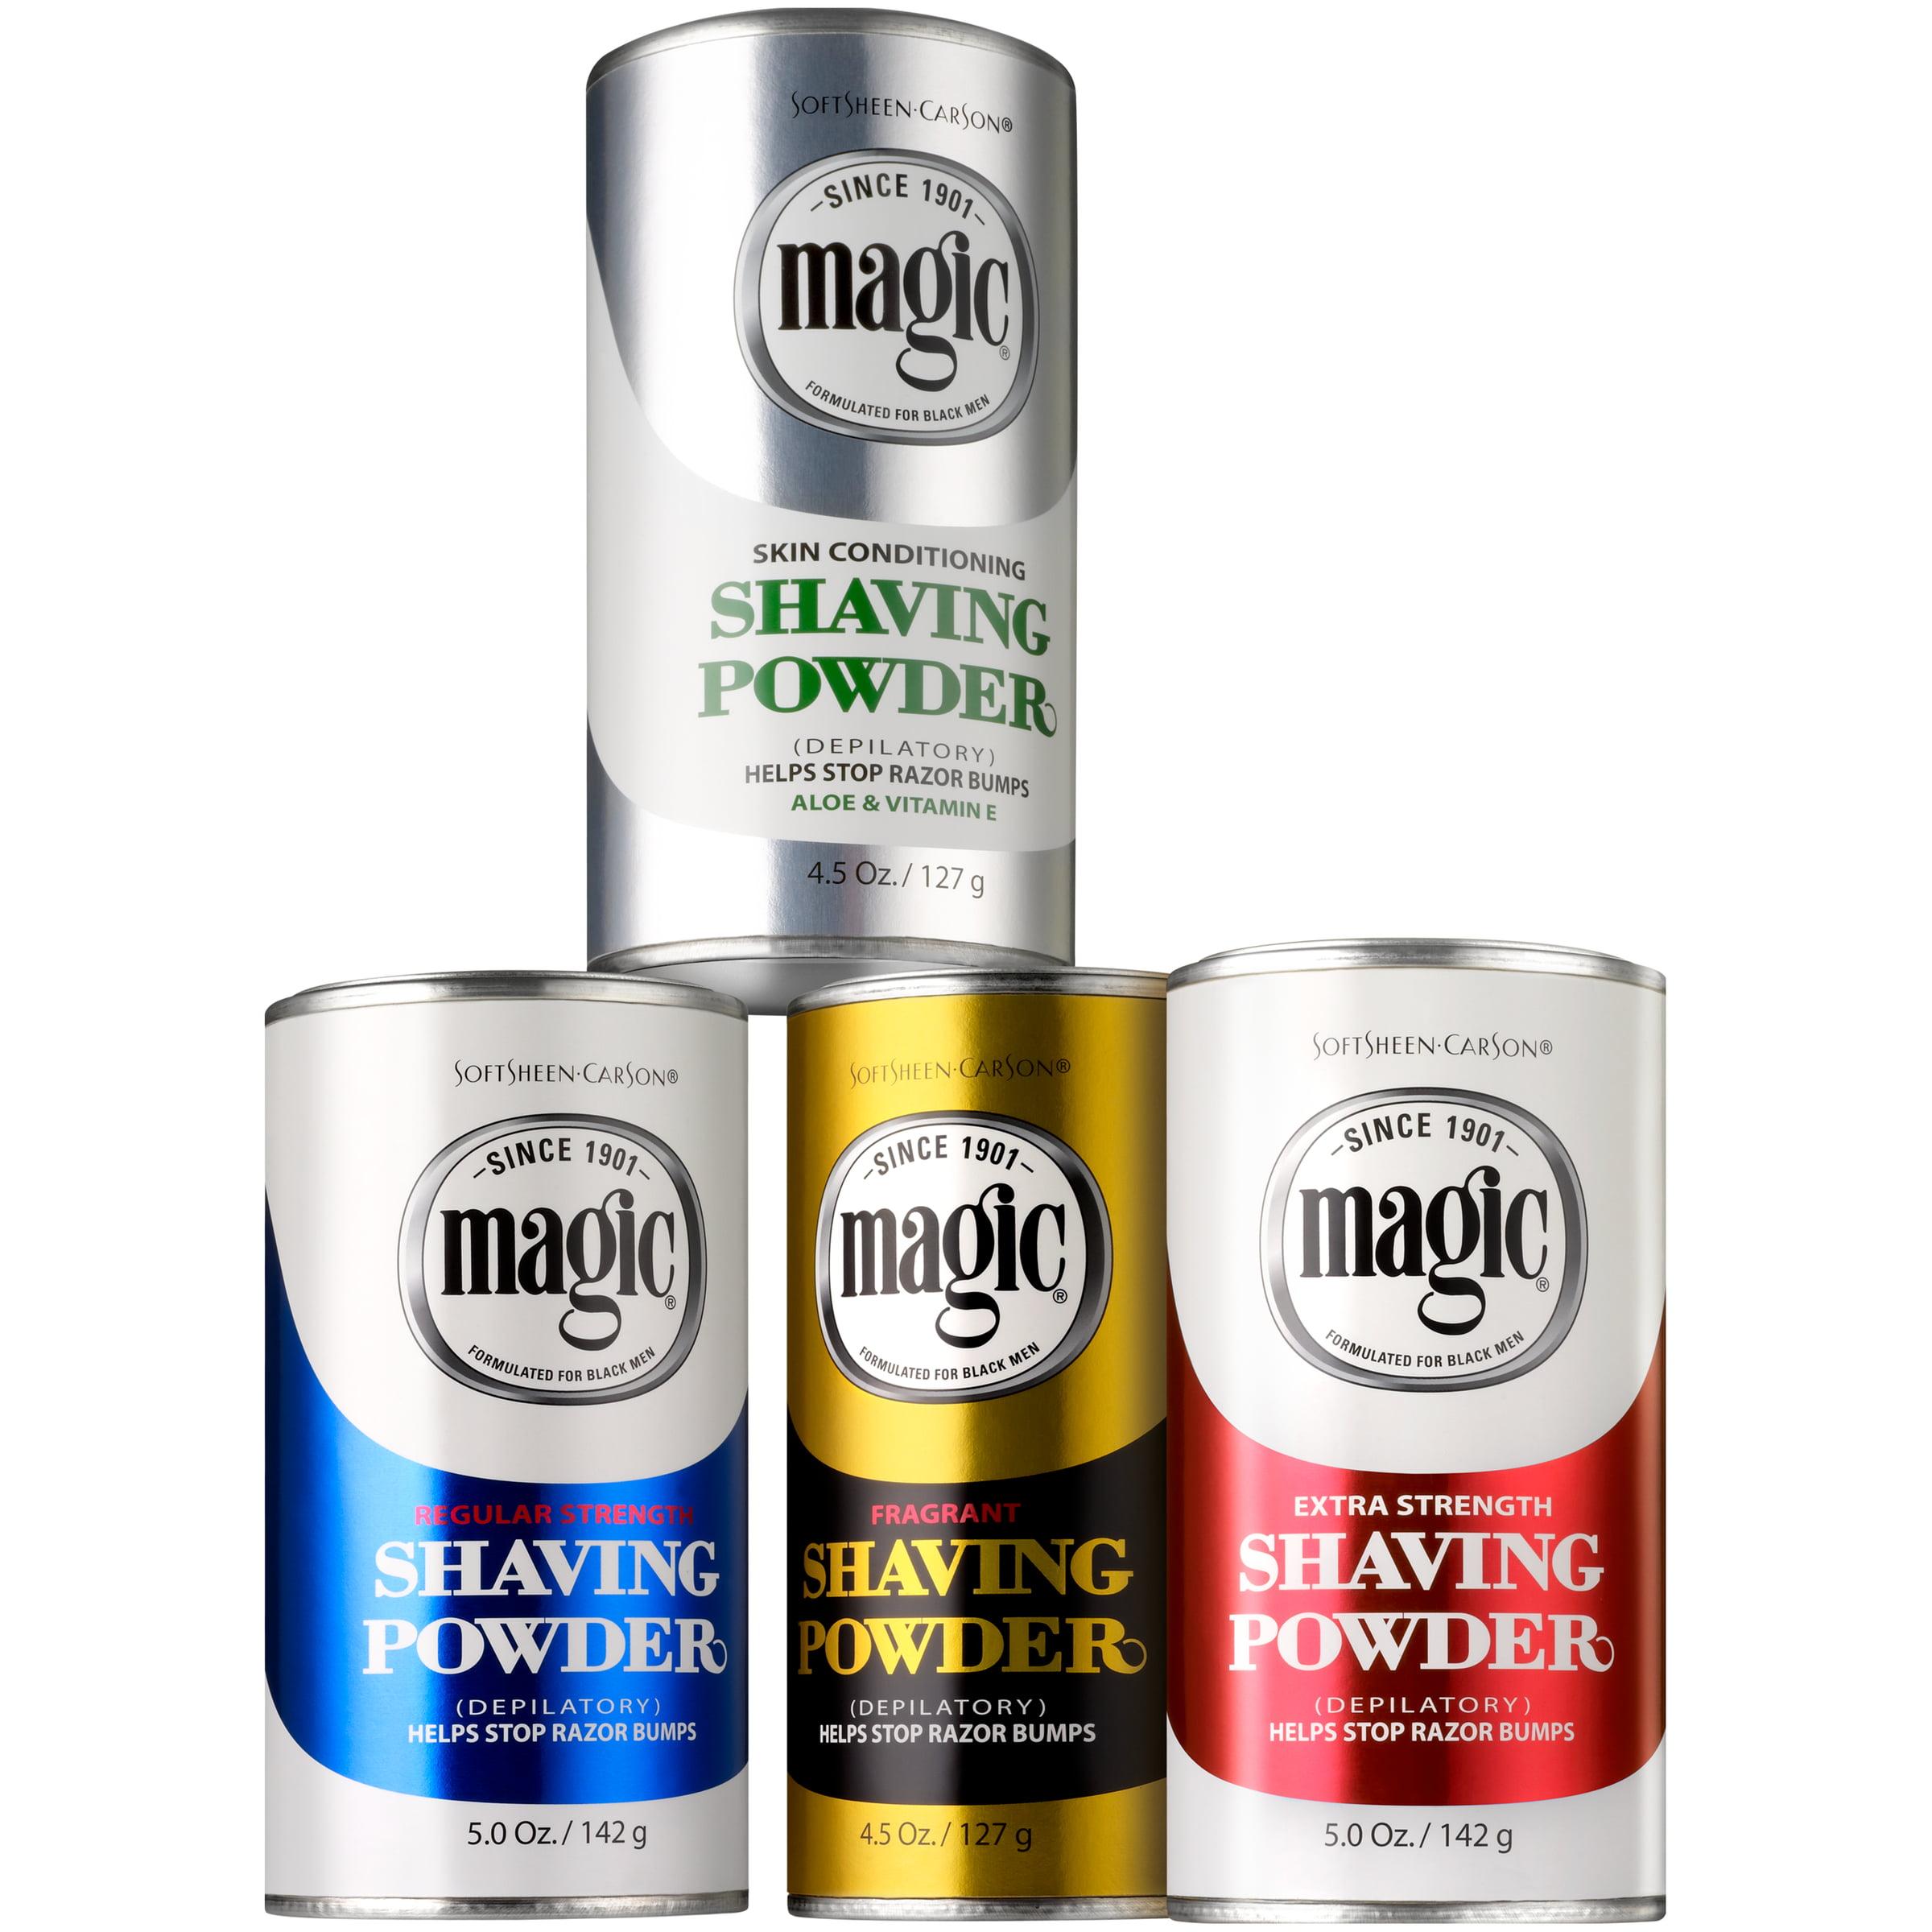 Softsheen Carson Magic Fragrant Shaving Powder Razorless Shaving